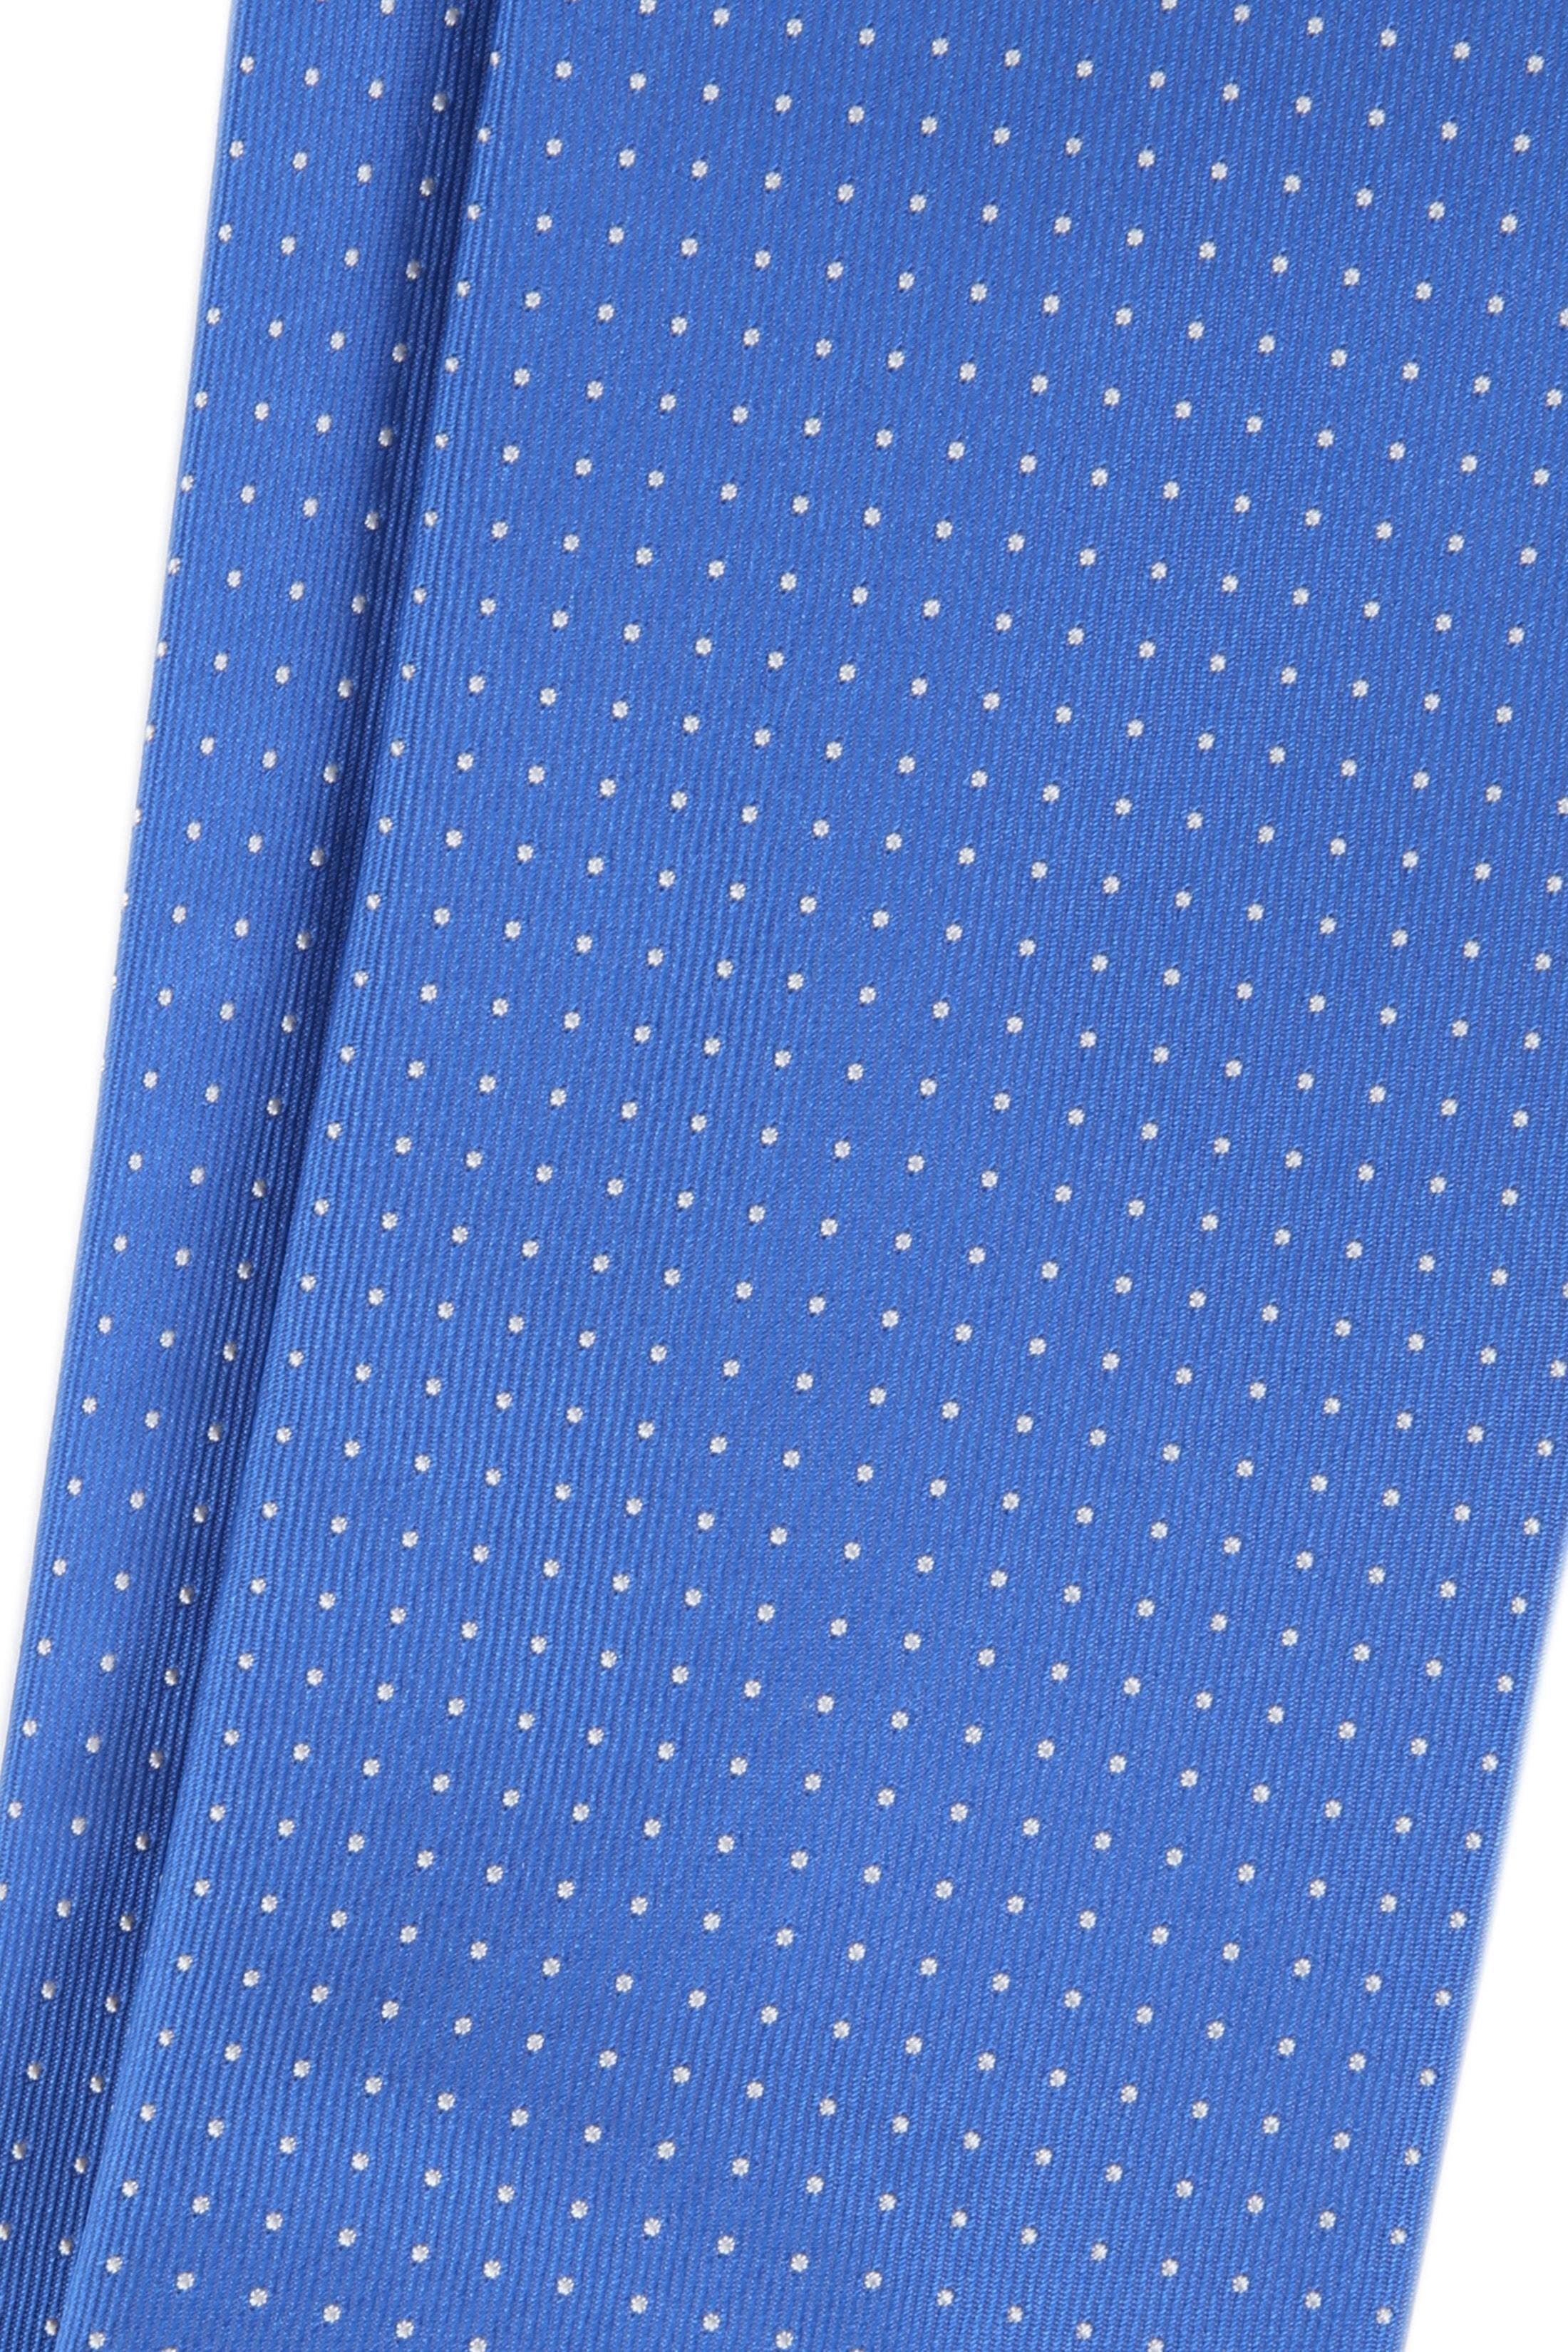 Silk Tie Dots Blue foto 1